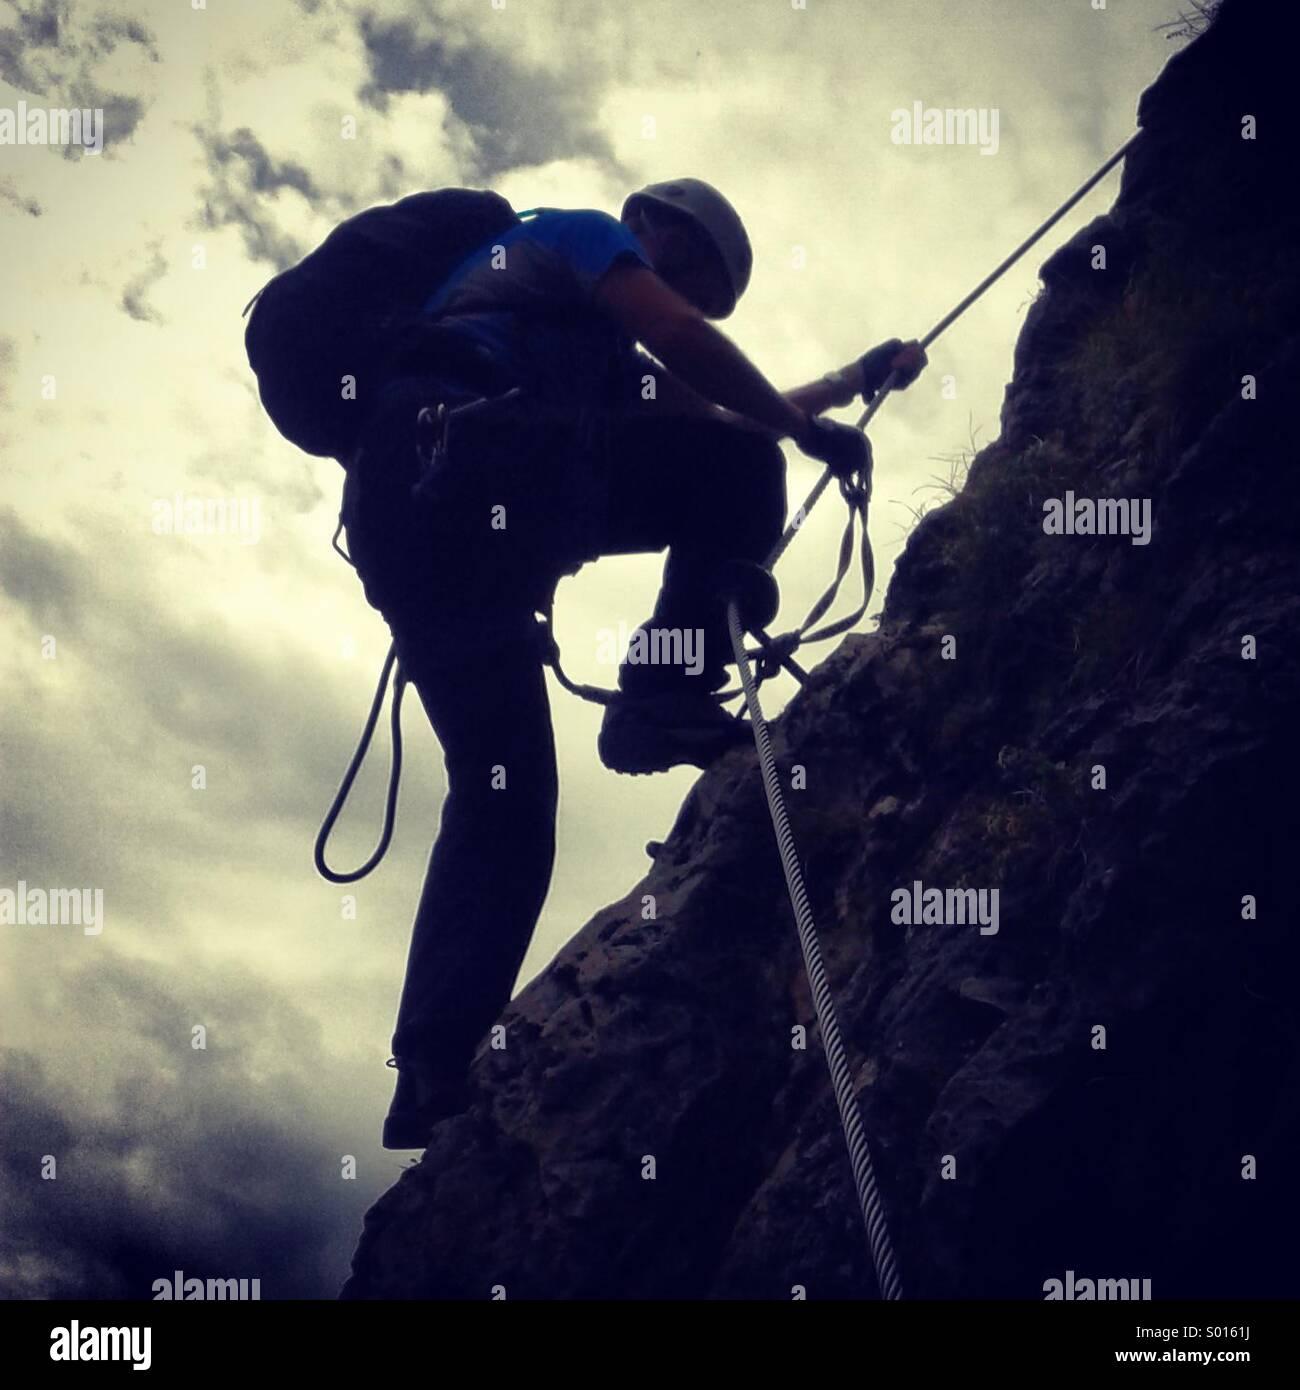 Mountain Climber, Via Ferrata, Dolomites, Italy. - Stock Image